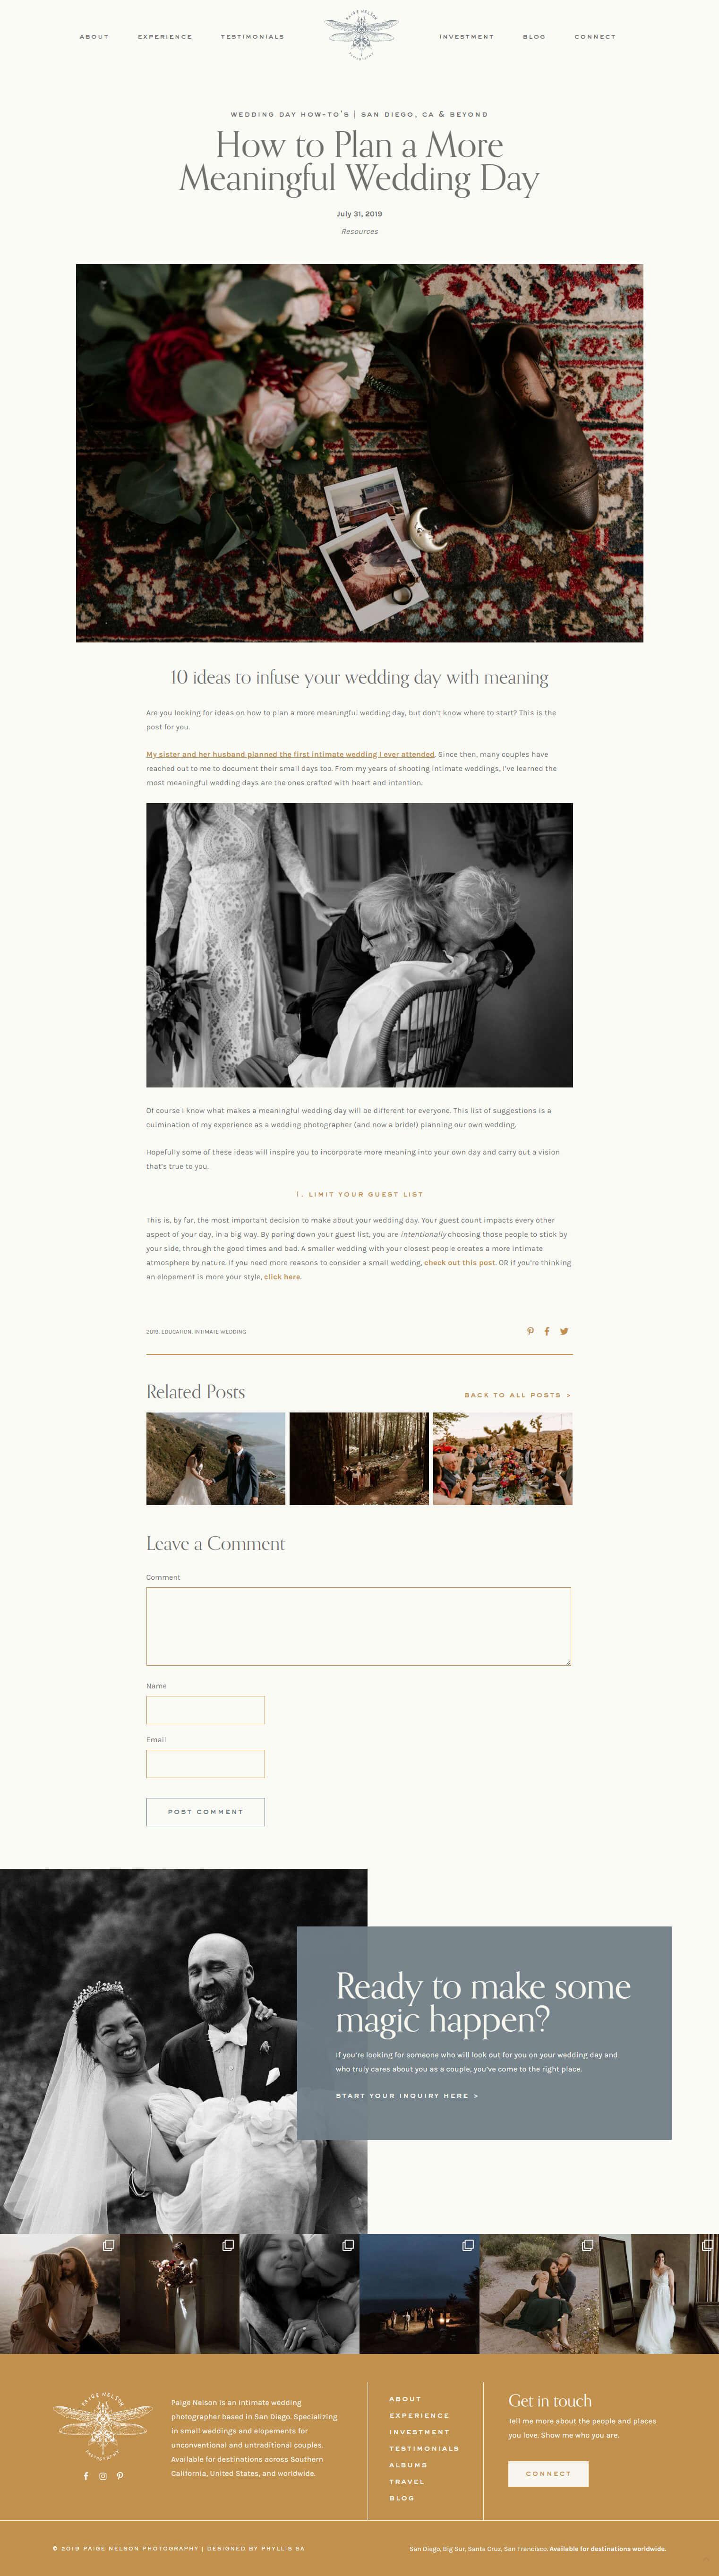 Paige Nelson Photography Blog post custom WordPress development